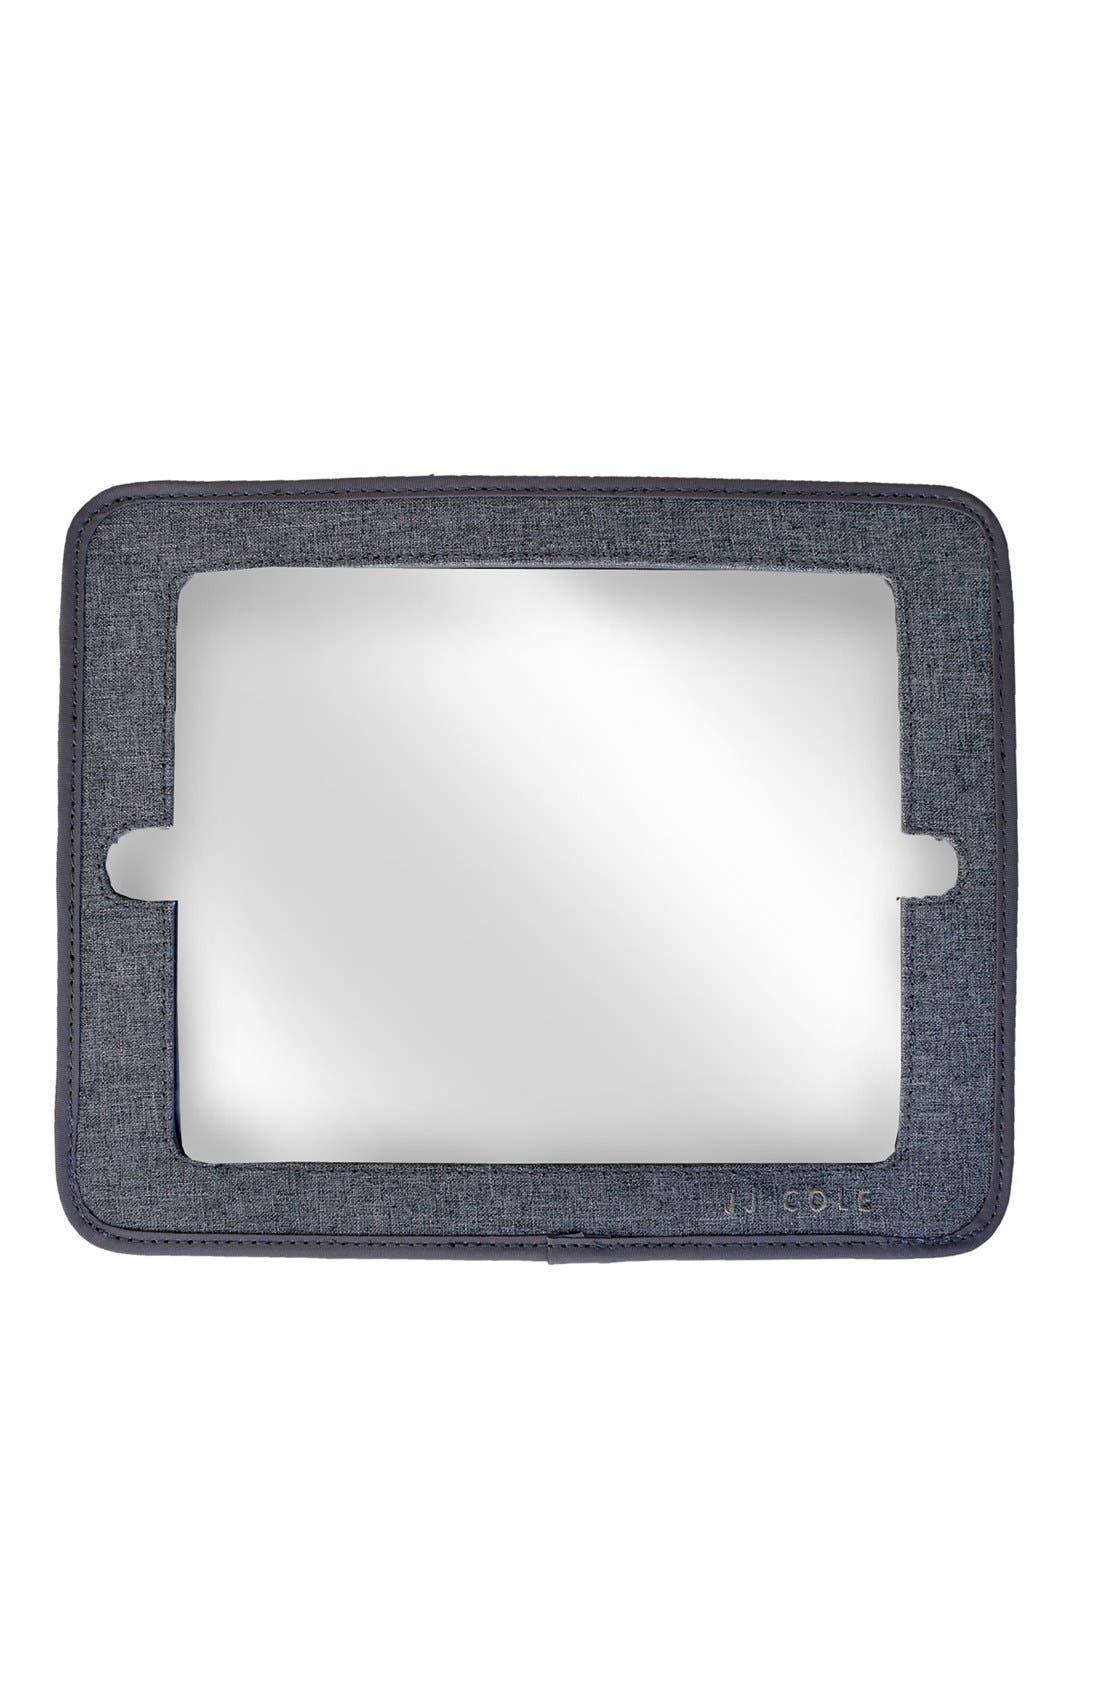 2-in-1 Mirror,                         Main,                         color, Gray Heather